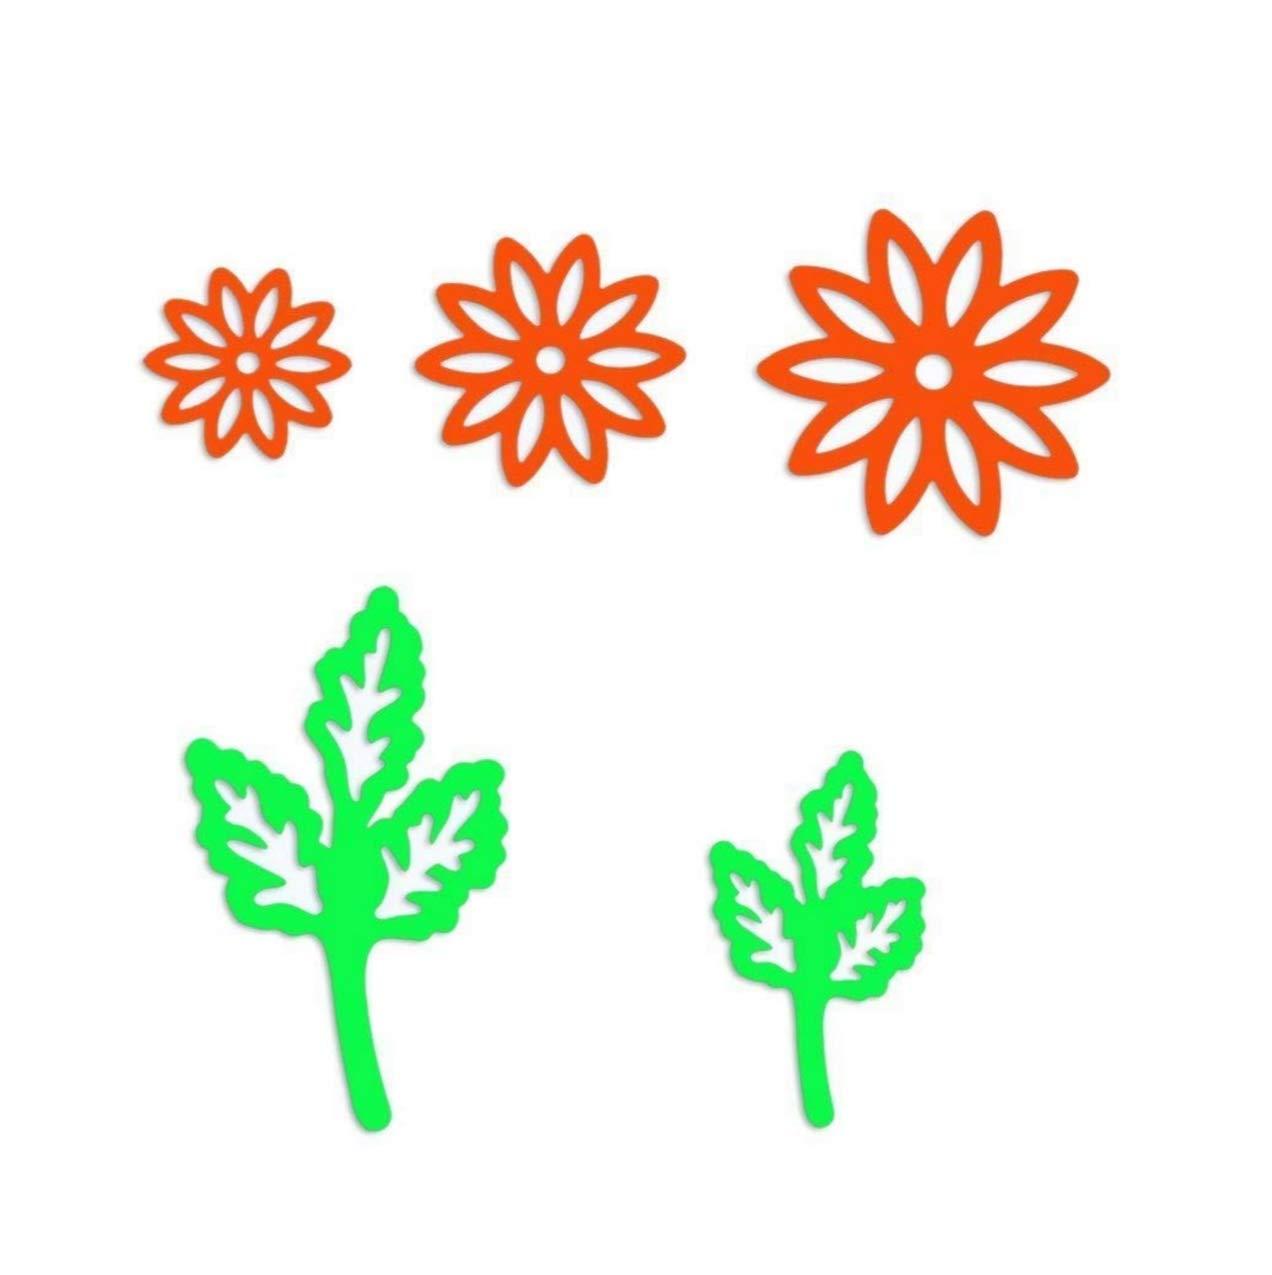 Whitelotous 5pcs Flower Leaves Cutting Dies Handmade DIY Stencils Template Embossing for Card Scrapbooking Craft